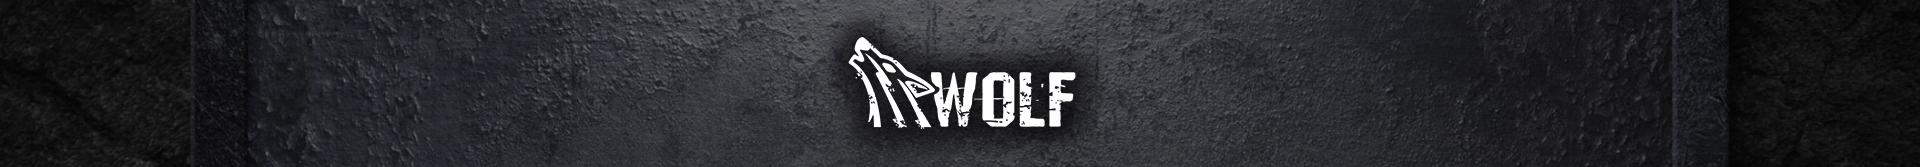 banner-wolf-top-desktop